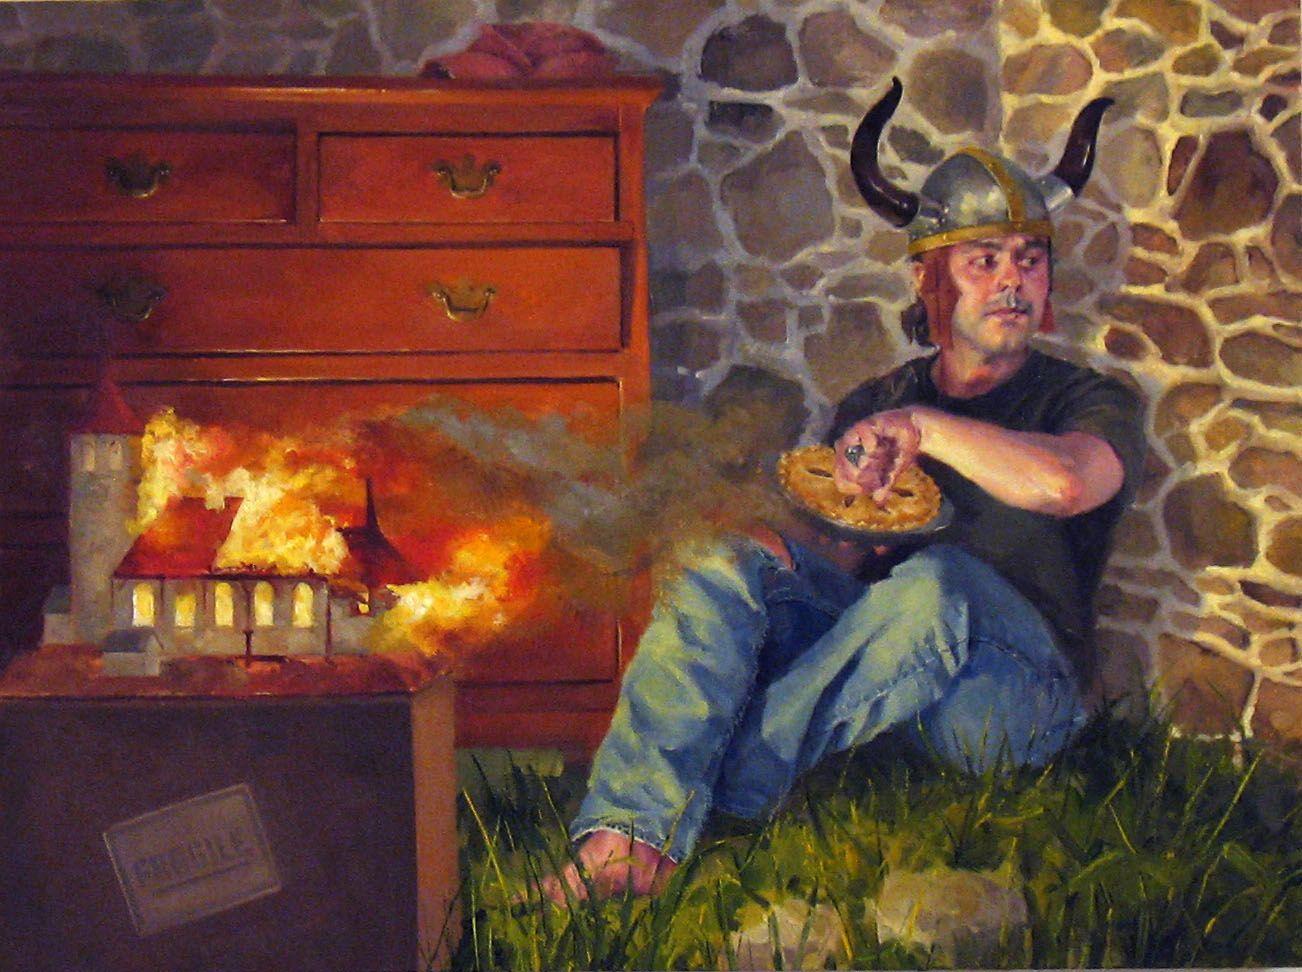 NATHANIEL ROGERS_Jack Horner (The Last Viking)_The Last Viking